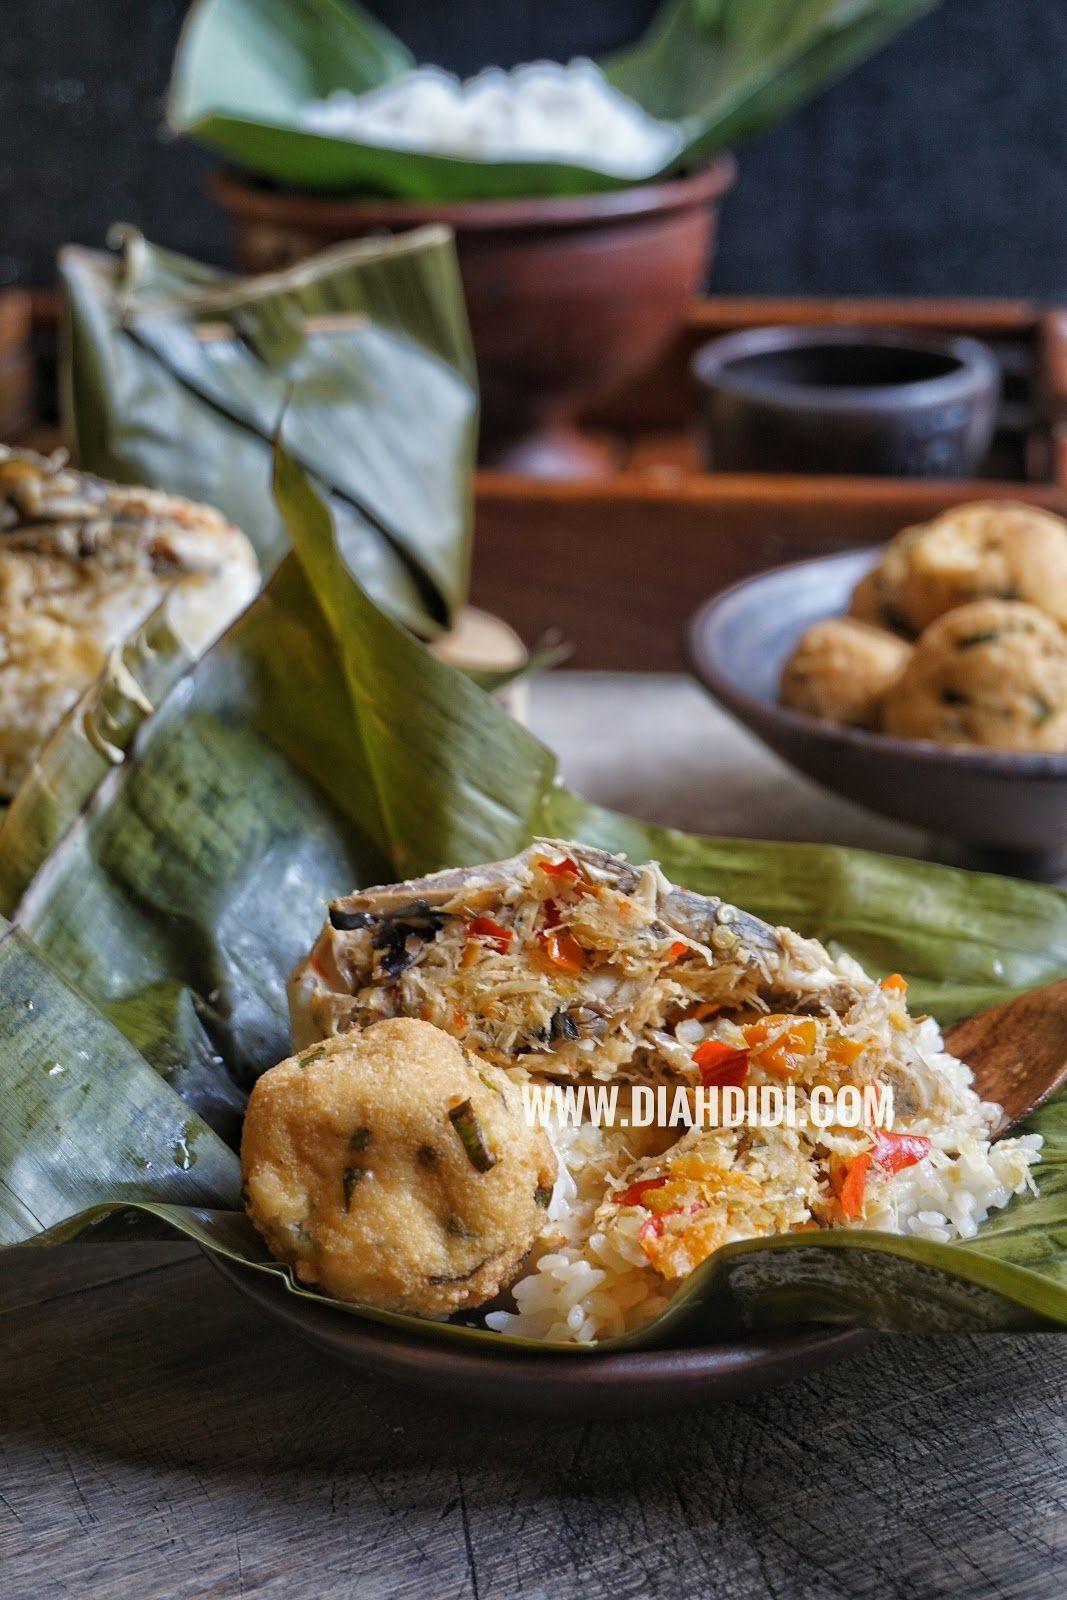 Sego Gegog Khas Ponorogo Masakan Indonesia Resep Masakan Makanan